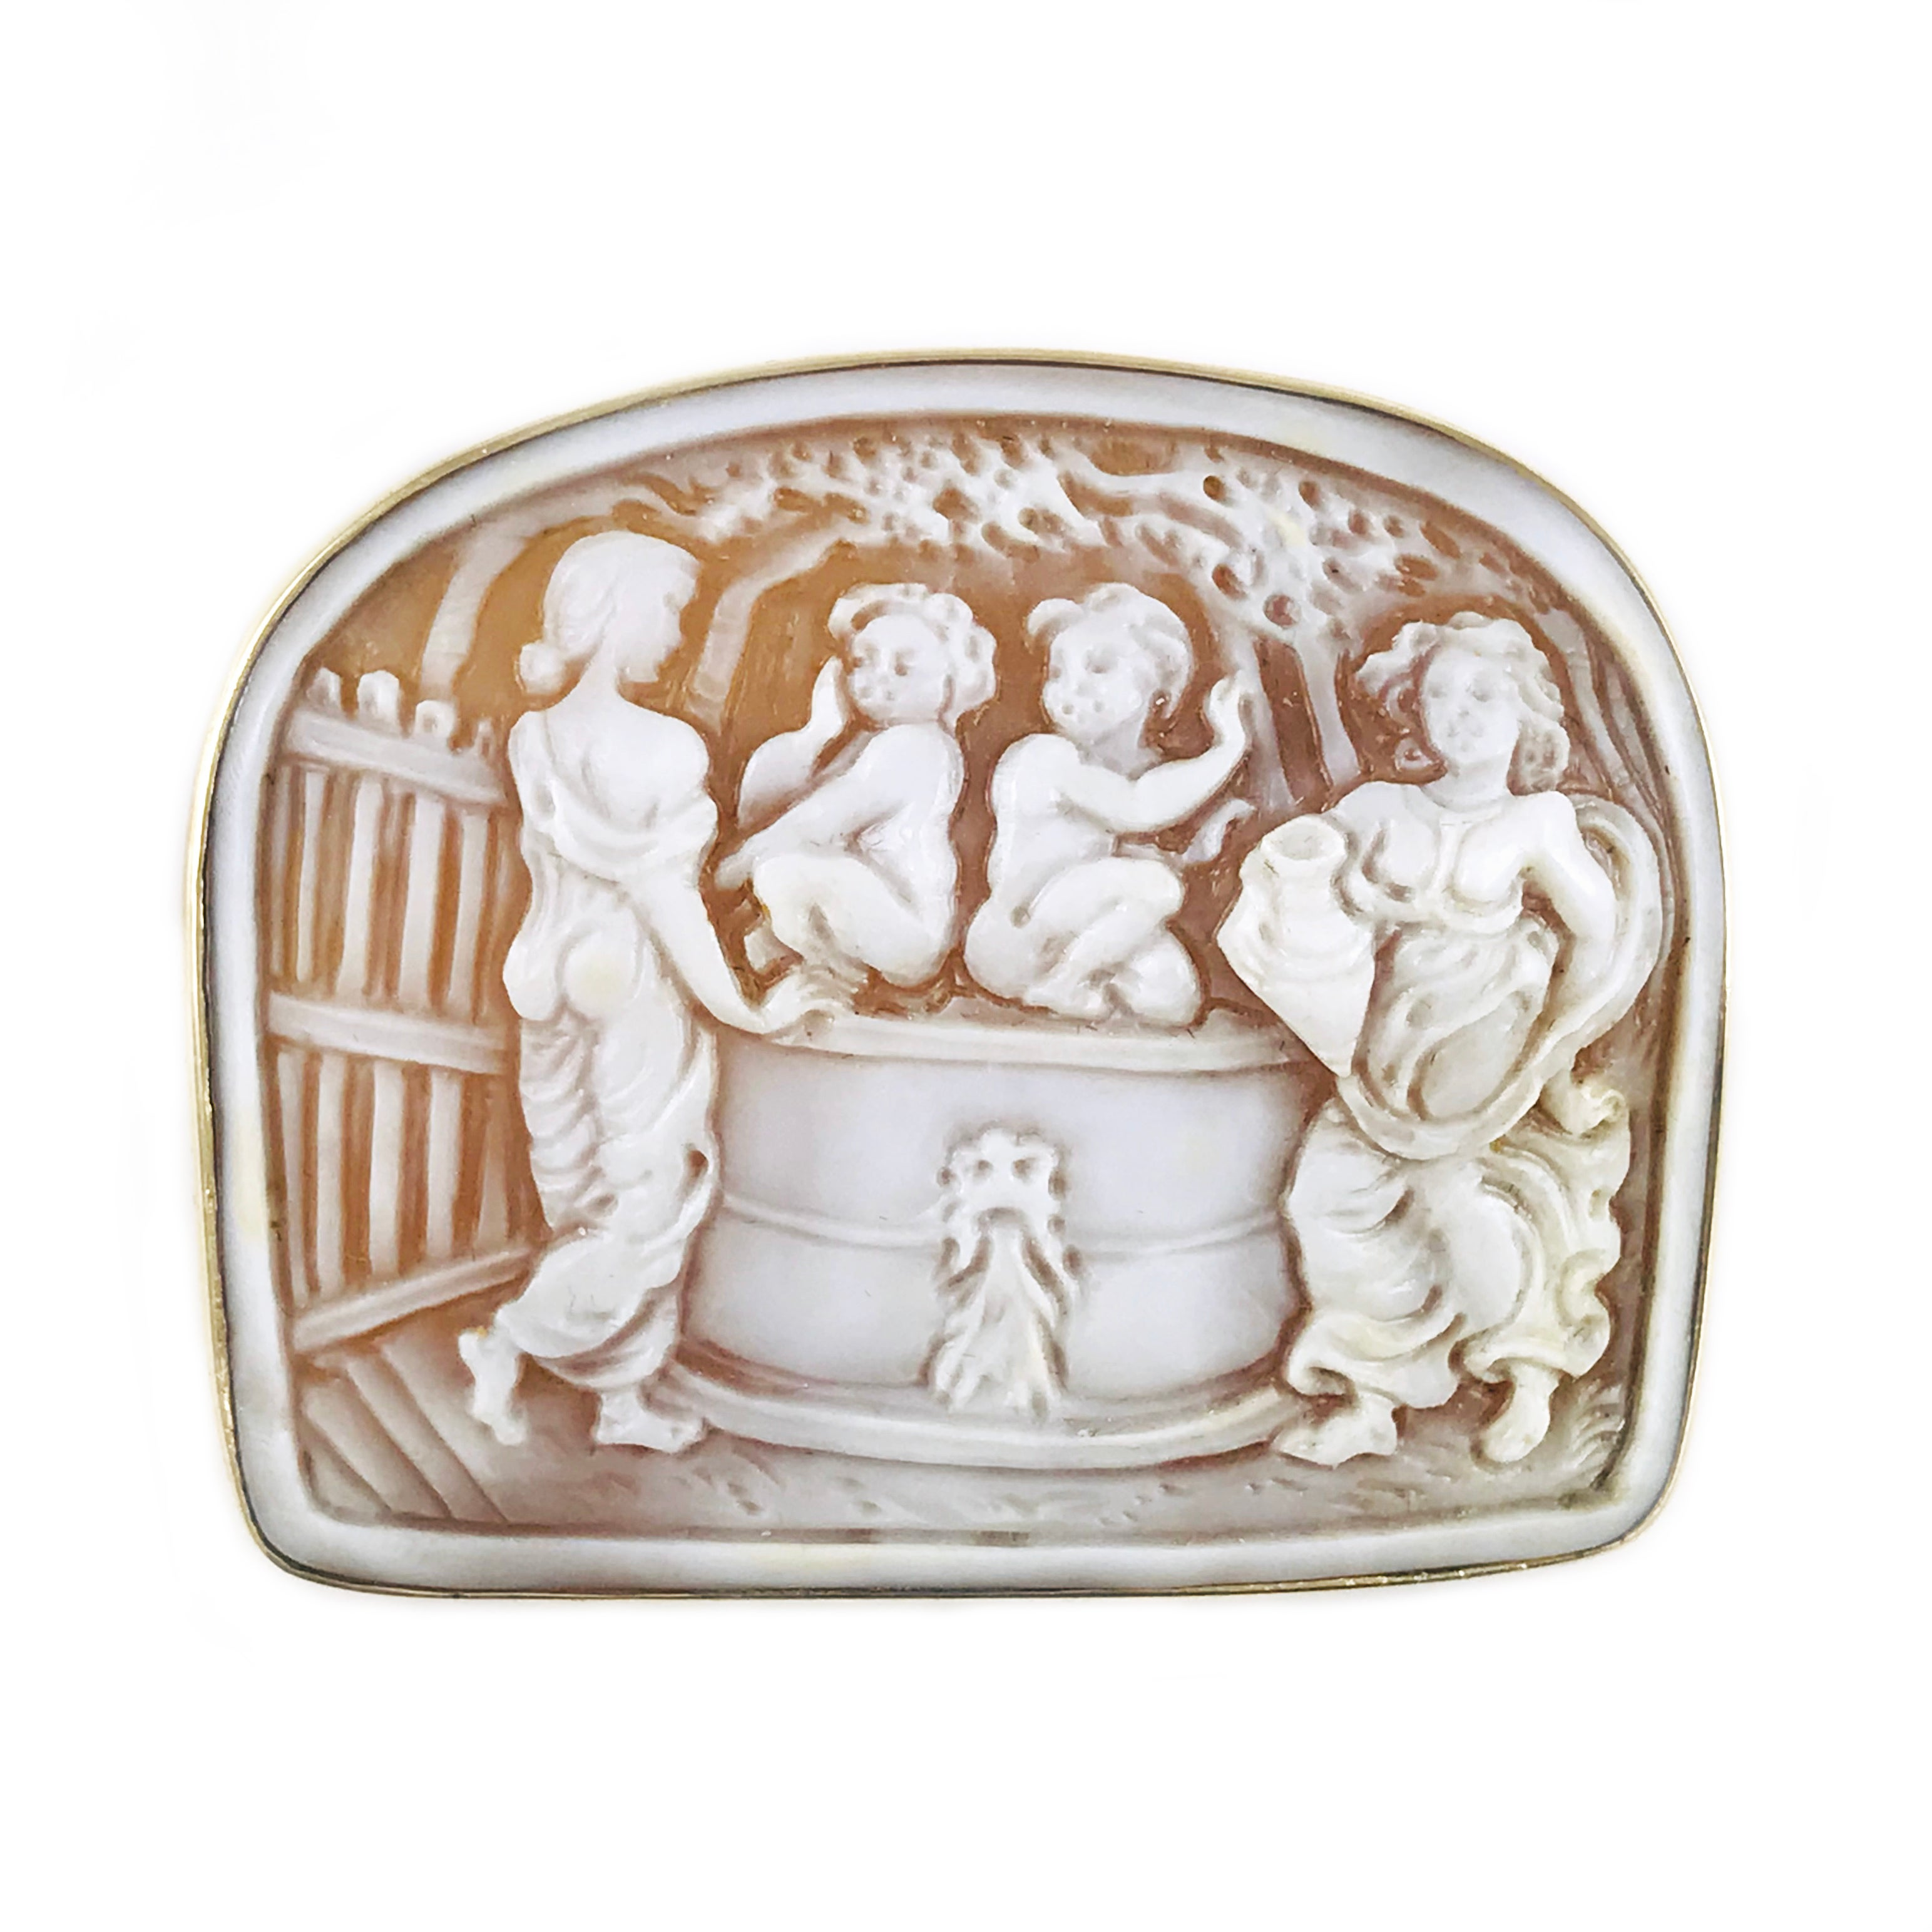 14 Karat Gold Shell Cameo Brooch Pendant, Fetching Water